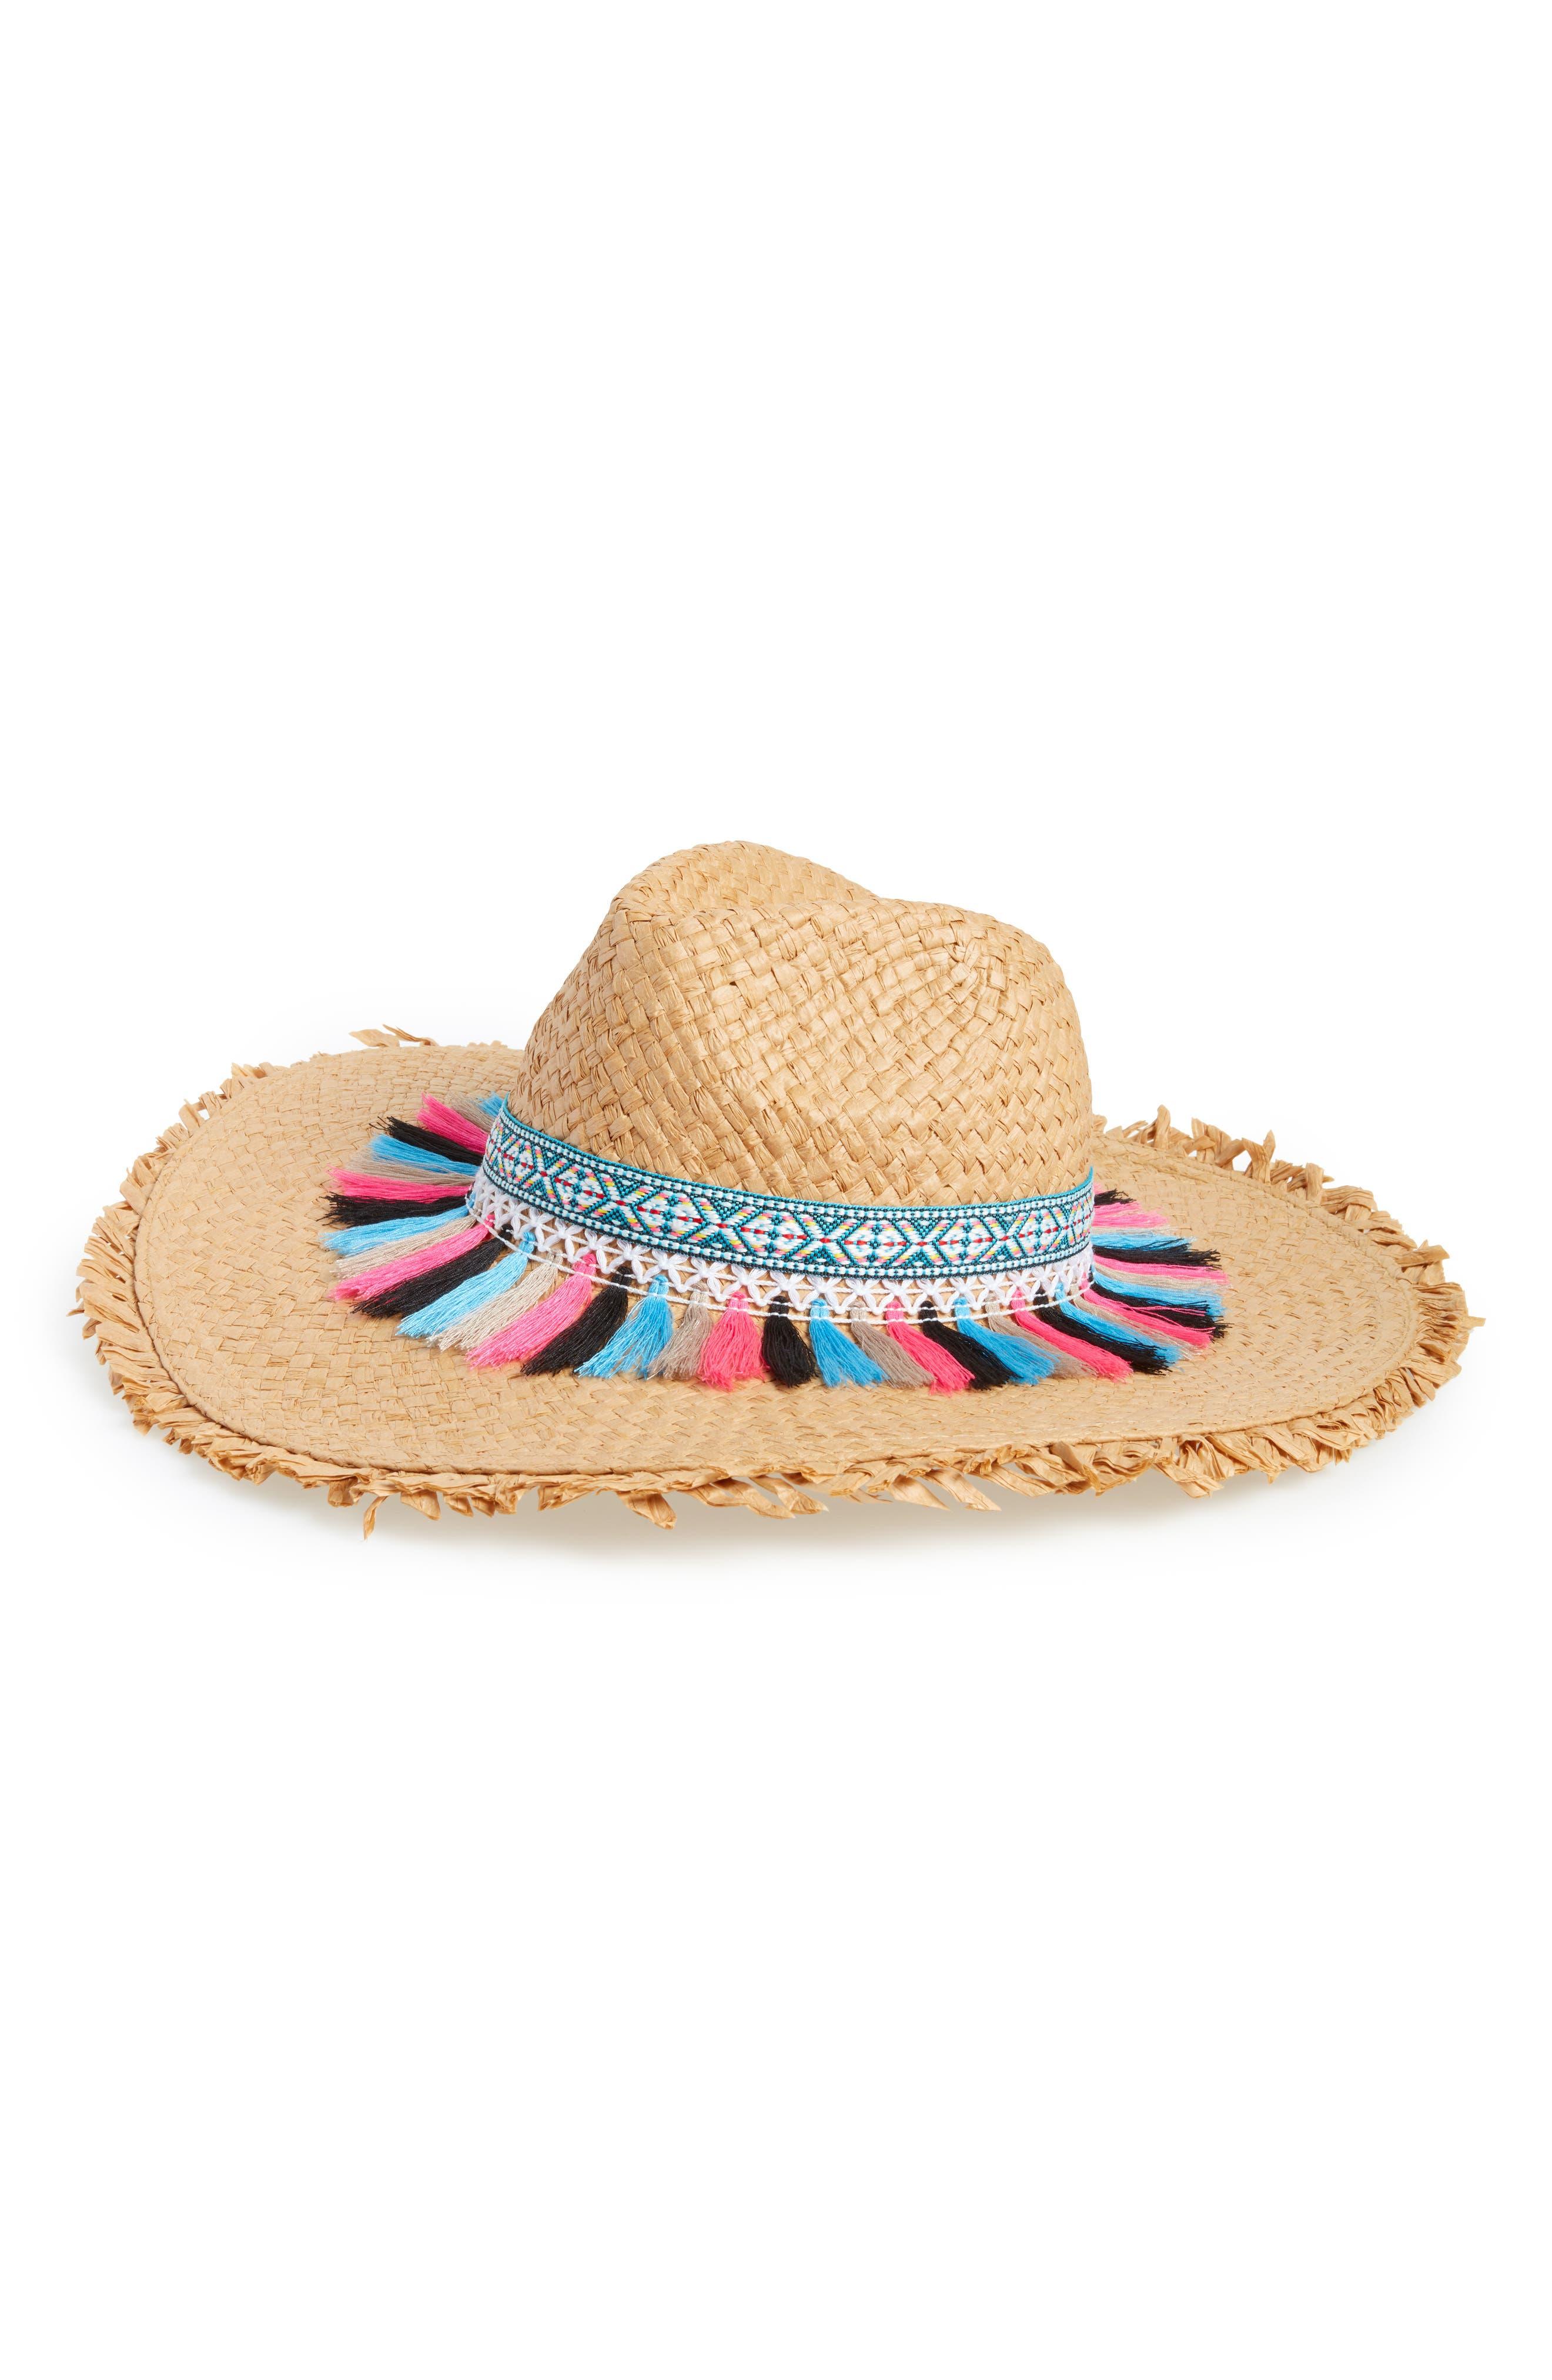 Festival Flair Panama Hat,                         Main,                         color, Pastel